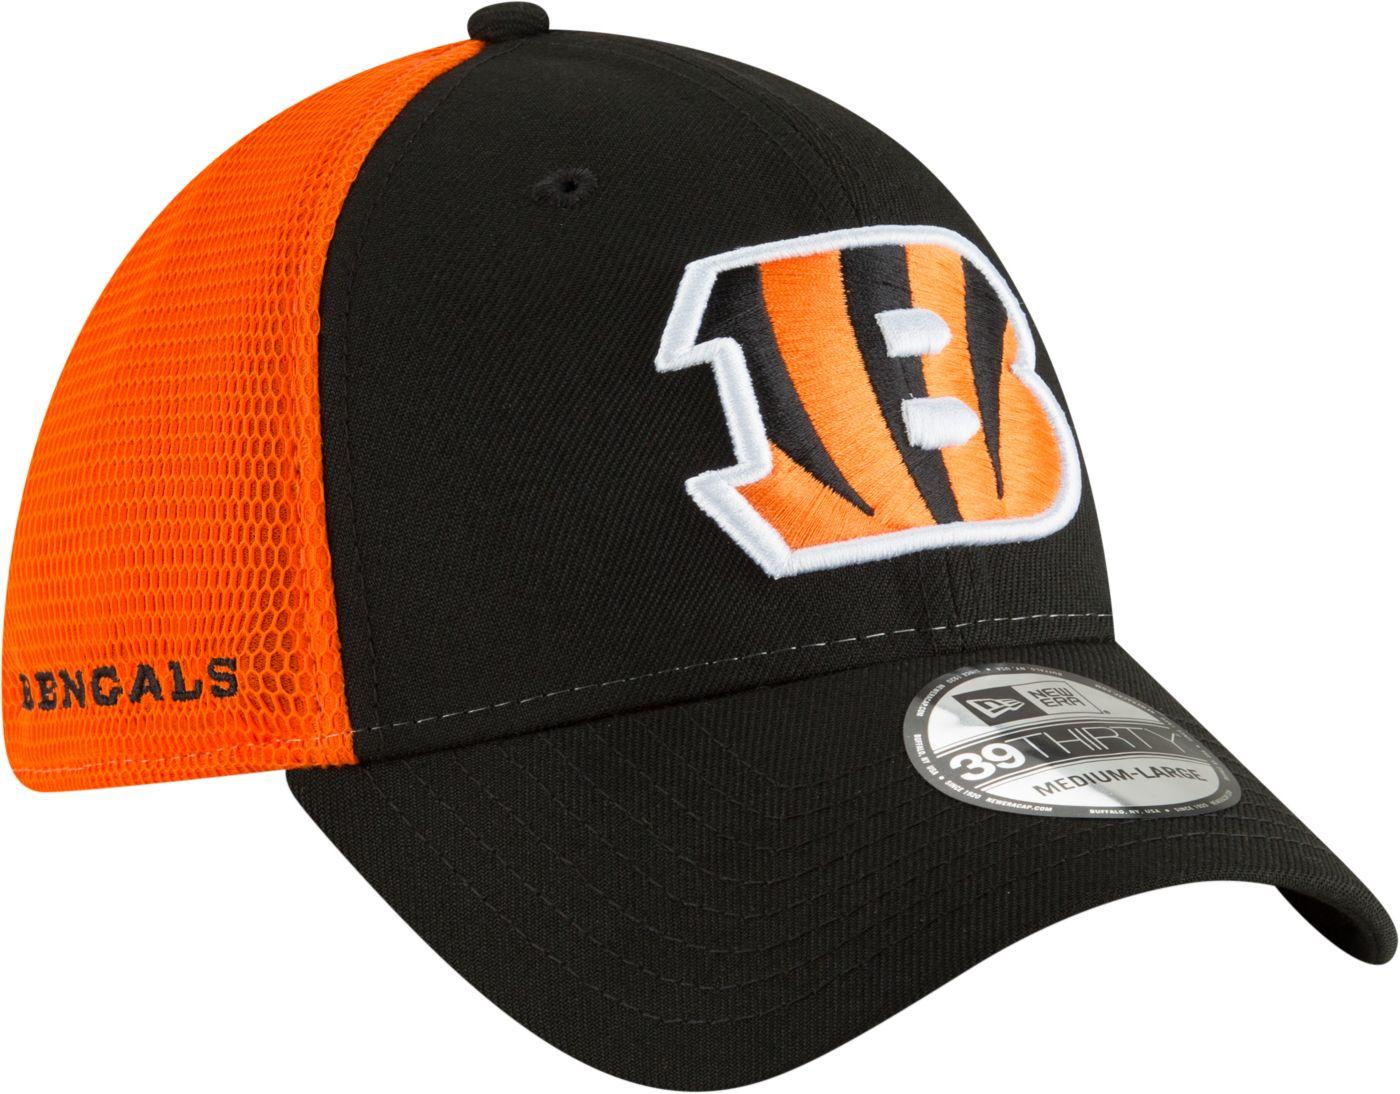 New Era Men's Cincinnati Bengals 2Tone Sided 39Thirty Stretch Fit Hat